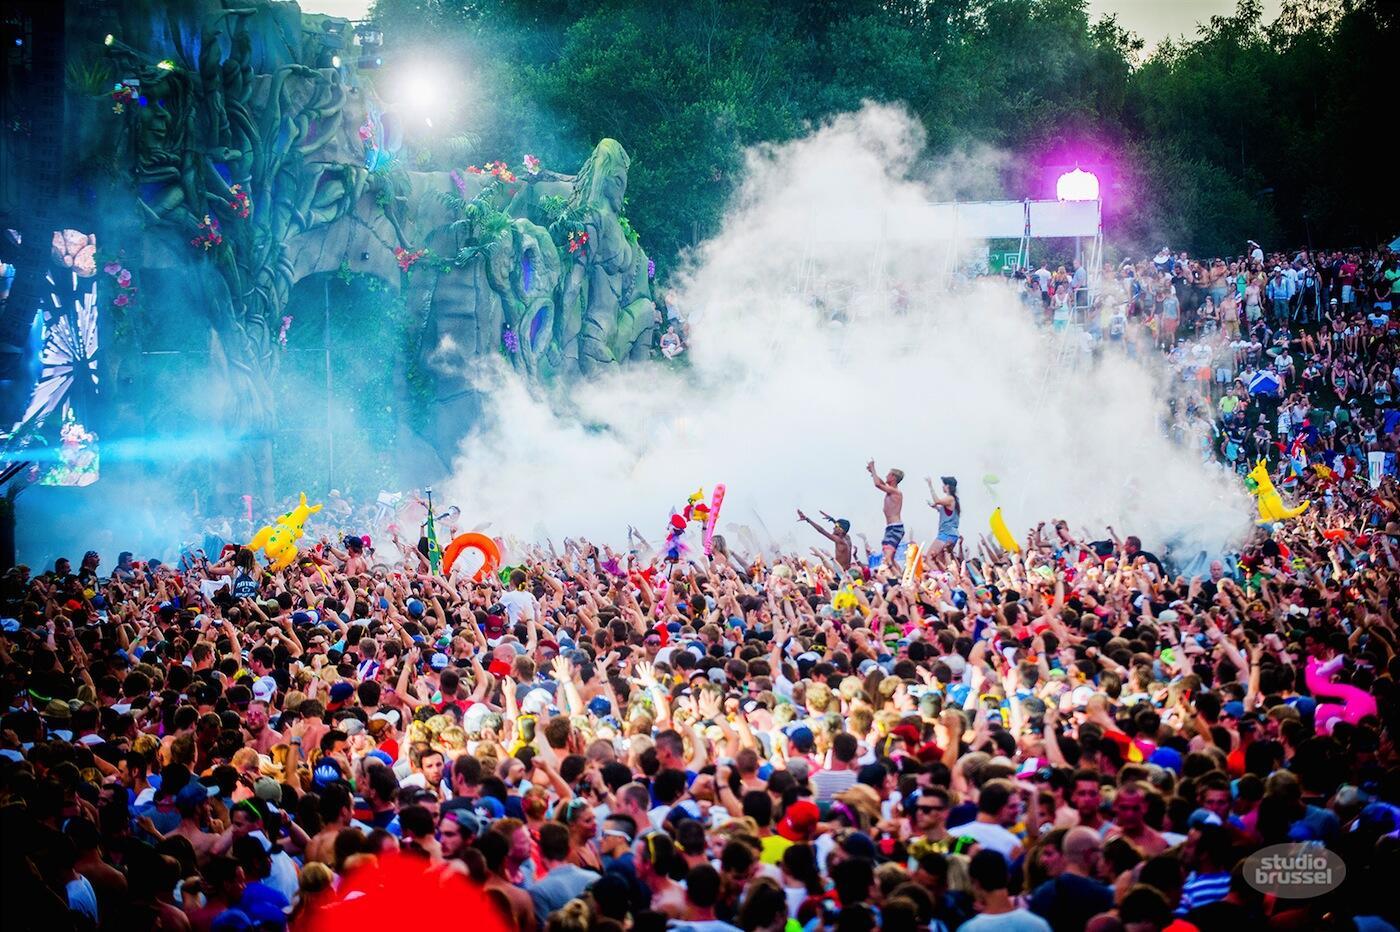 Don't miss a beat dankzij All Areas! Tomorrowland, dag 3: de komende 10 uur live op je radio, go! http://t.co/YJglSOXzv9